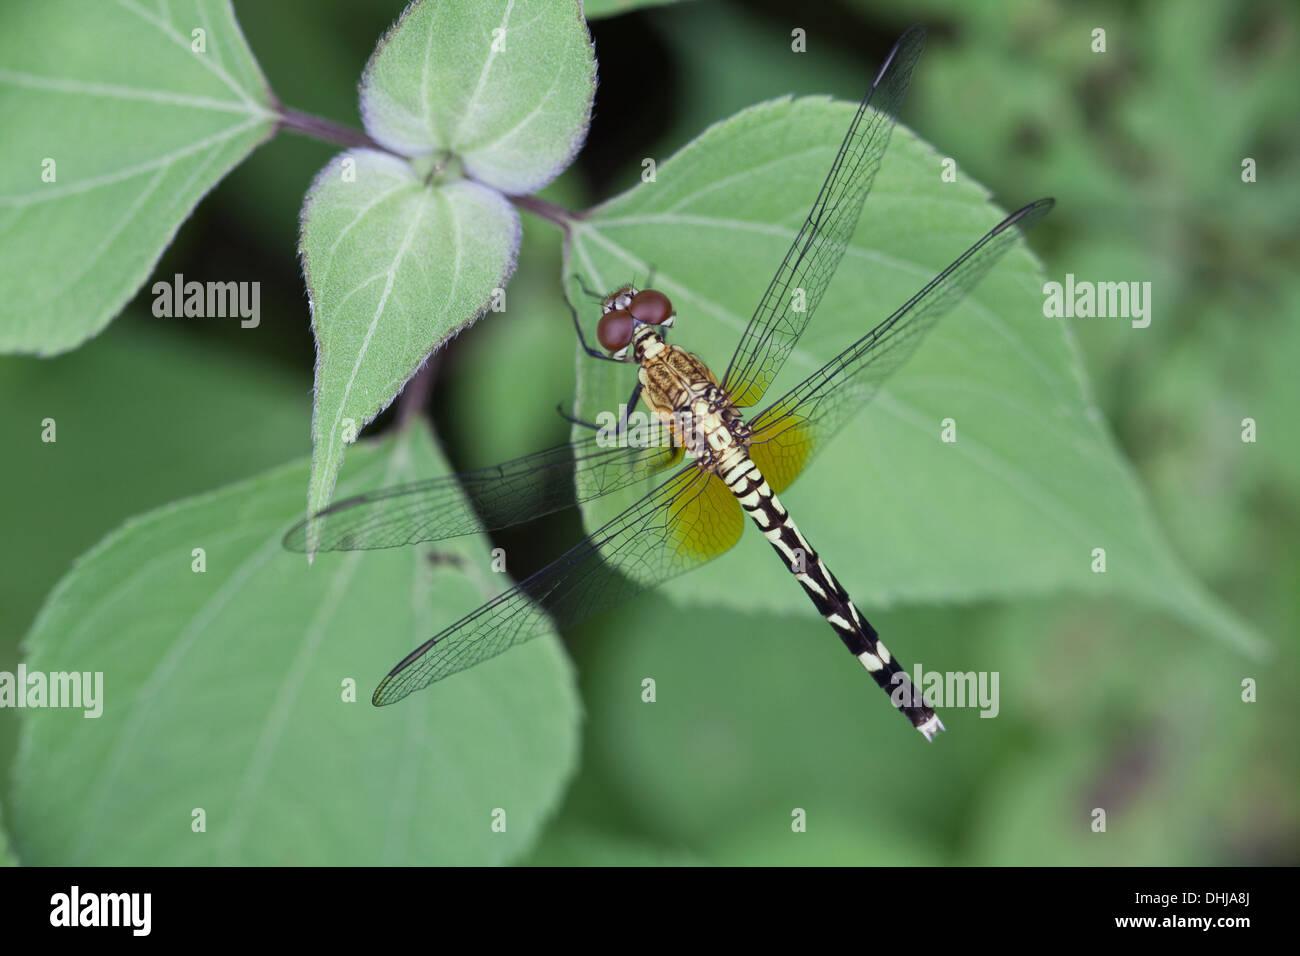 Dragonfly in Cienaga las Macanas Nature Reserve, Herrera province, Republic of Panama. Stock Photo